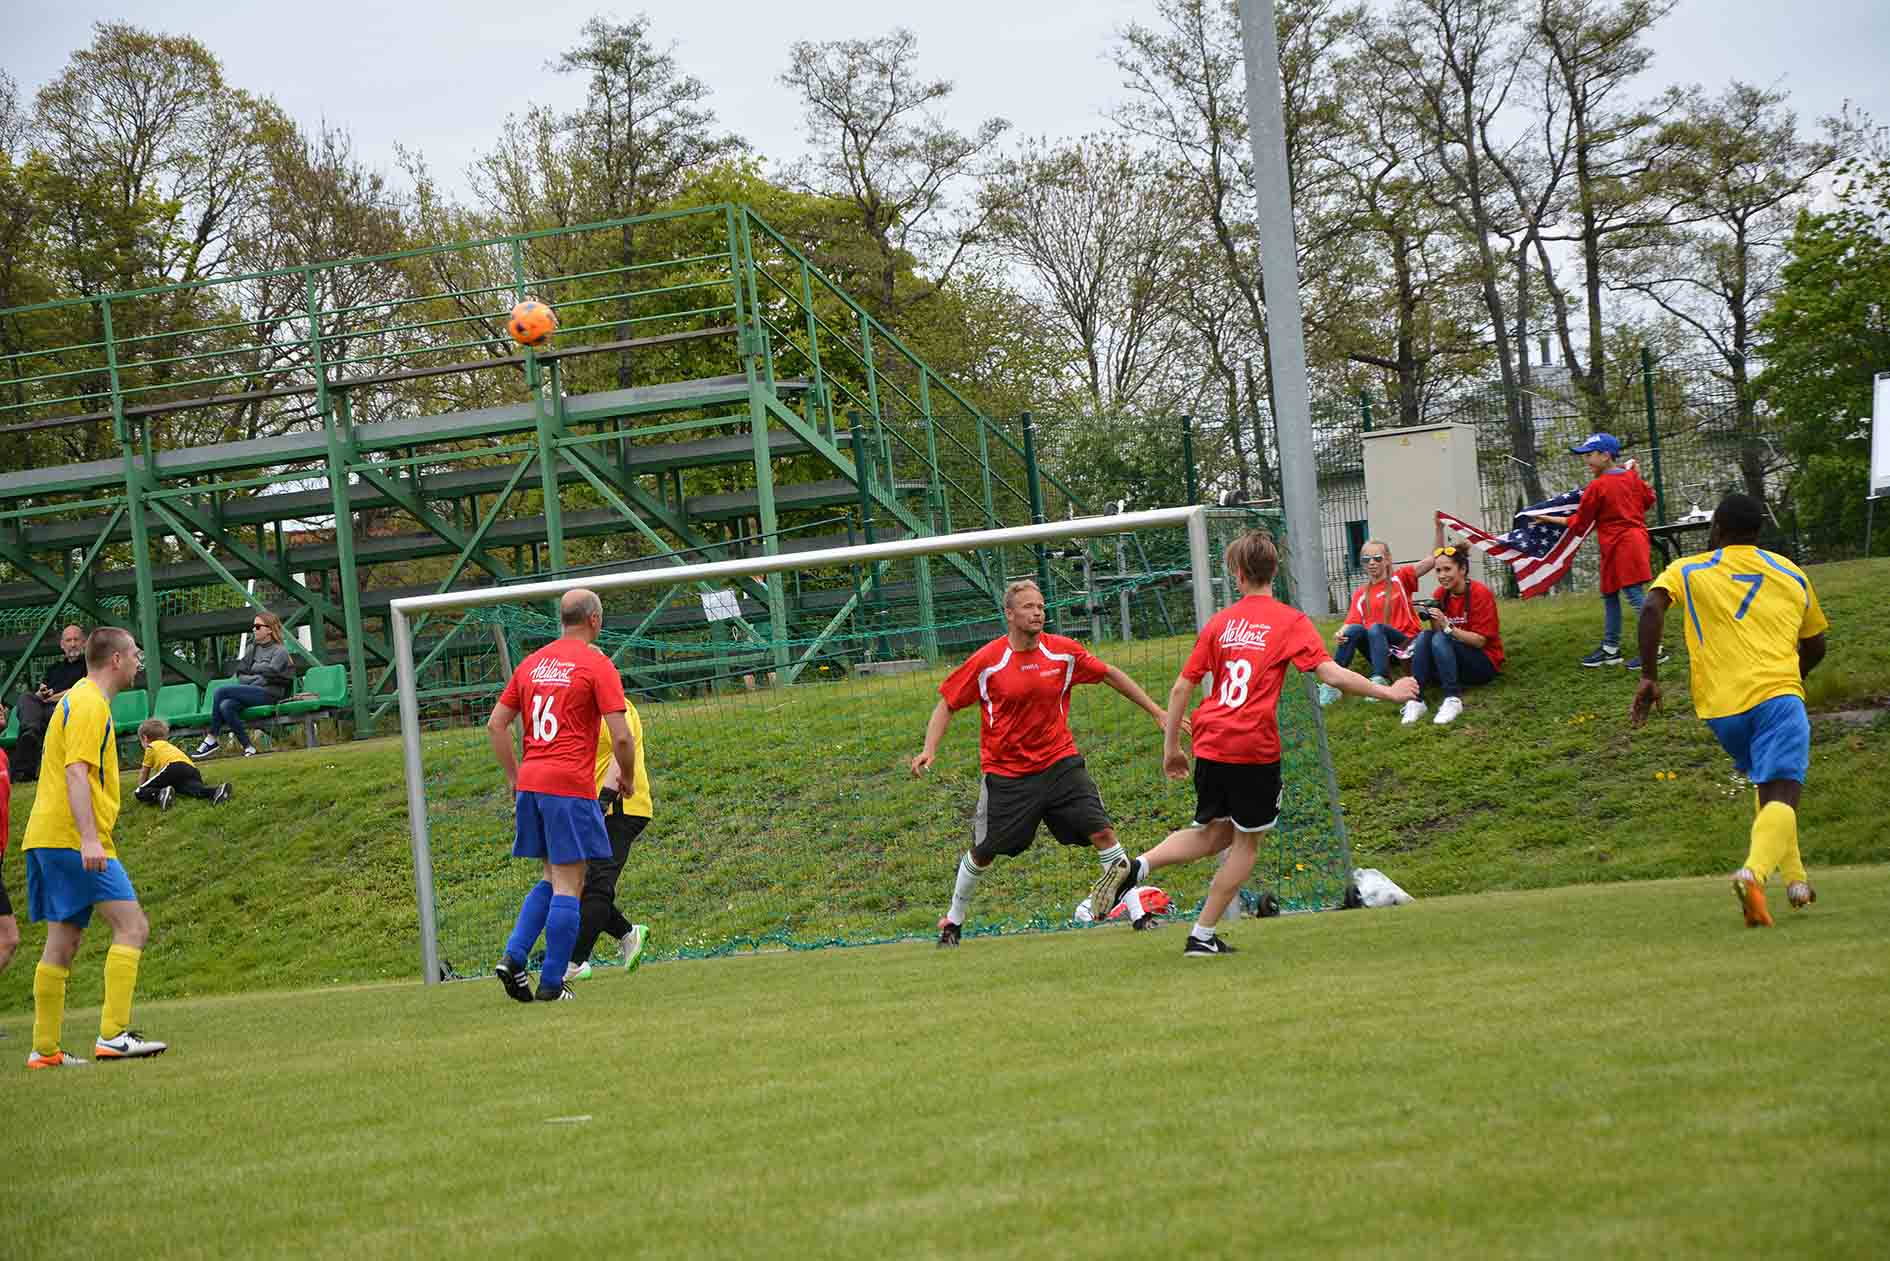 2017.05.27 Football tournament (3)